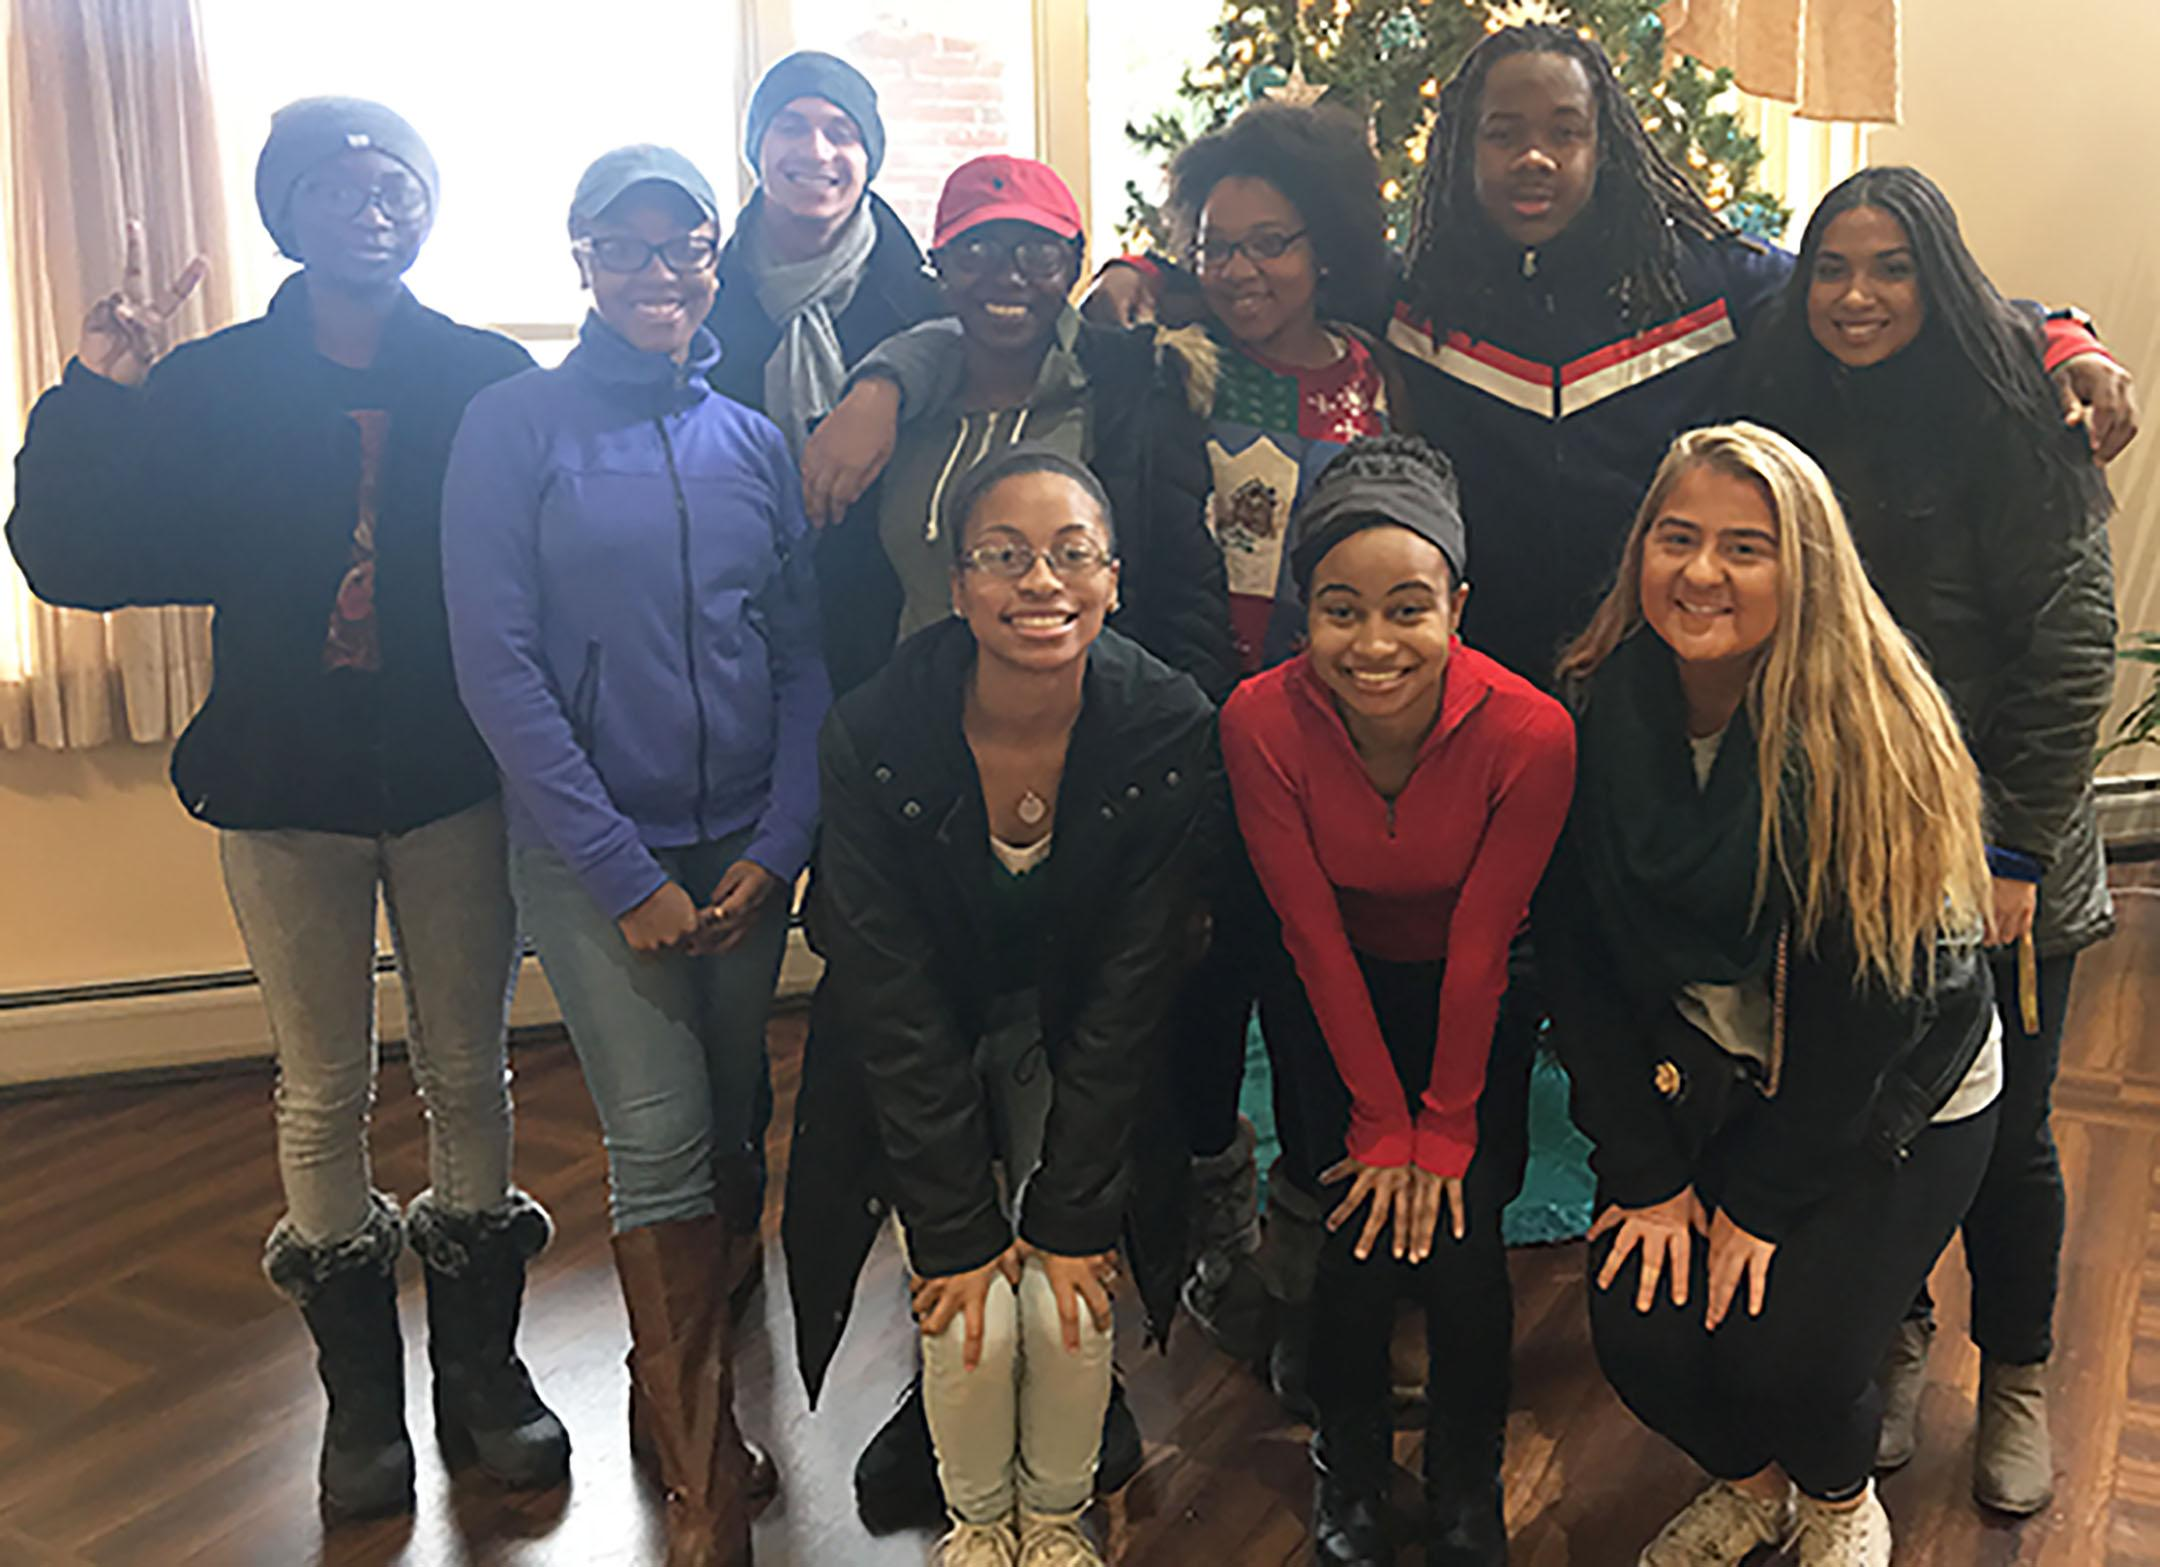 Black Student Union looks to educate campus